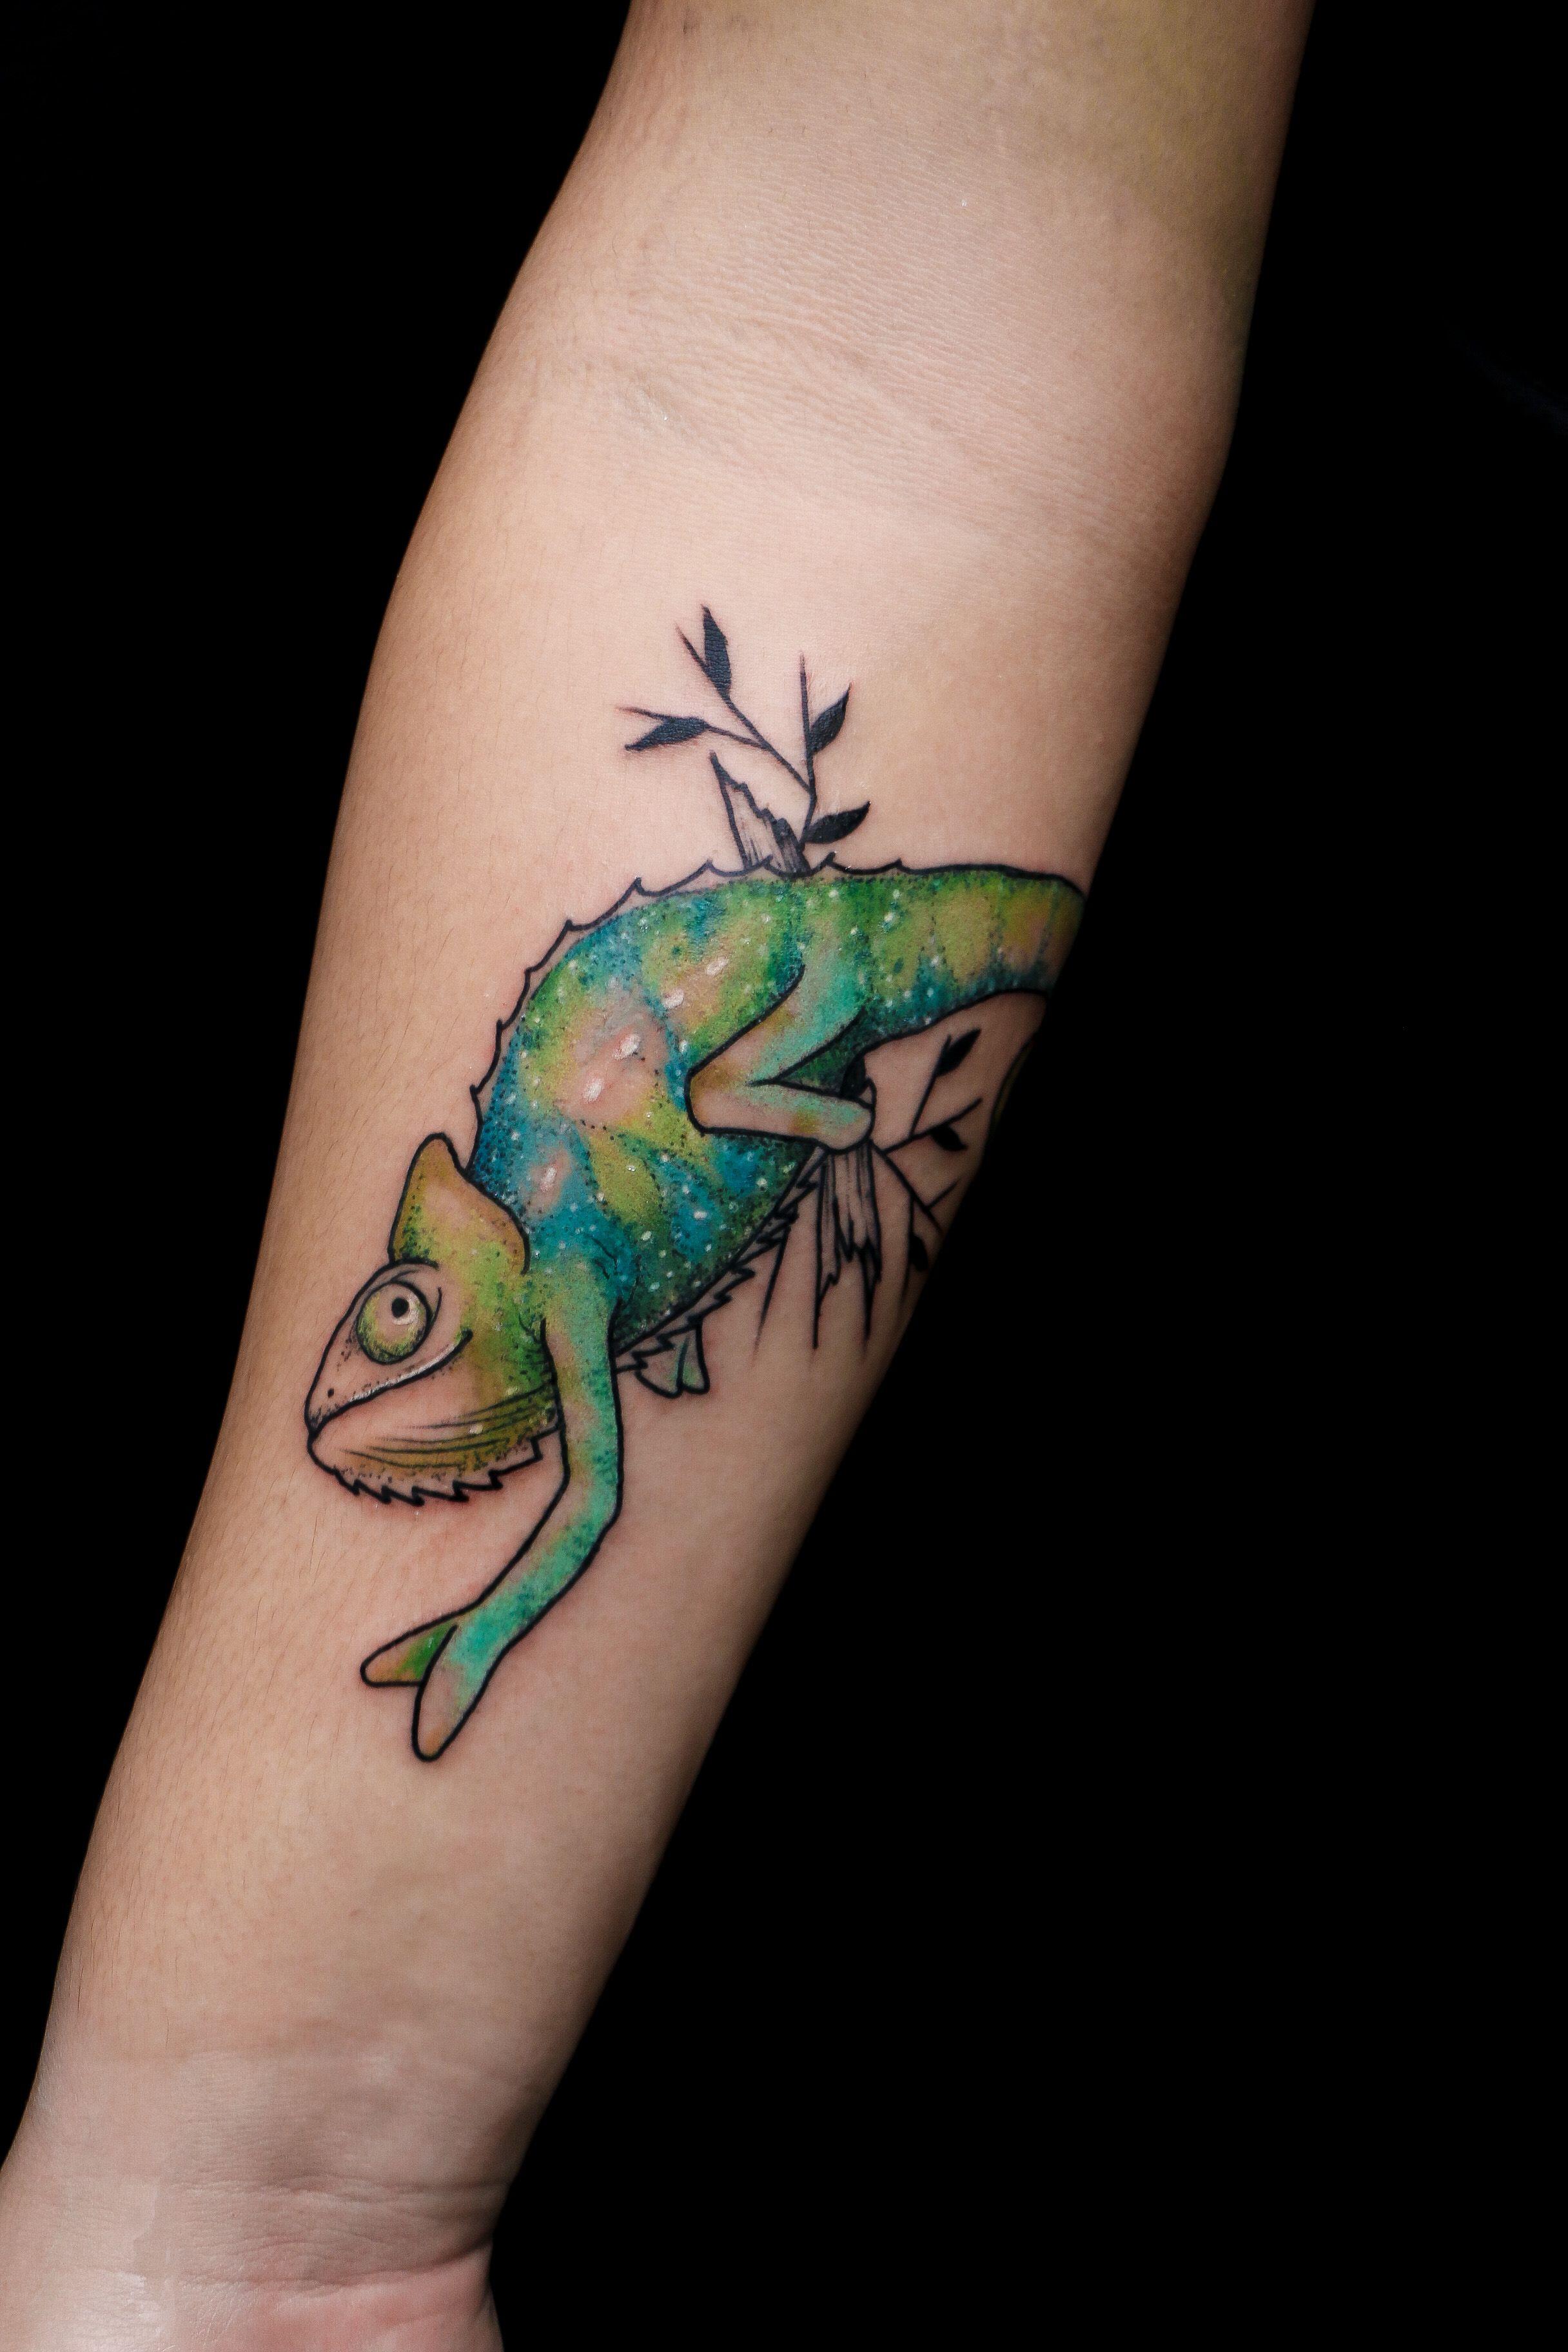 Chameleon Tattoo By Anzo Choi My Tattoo Work Tattoos Chameleon